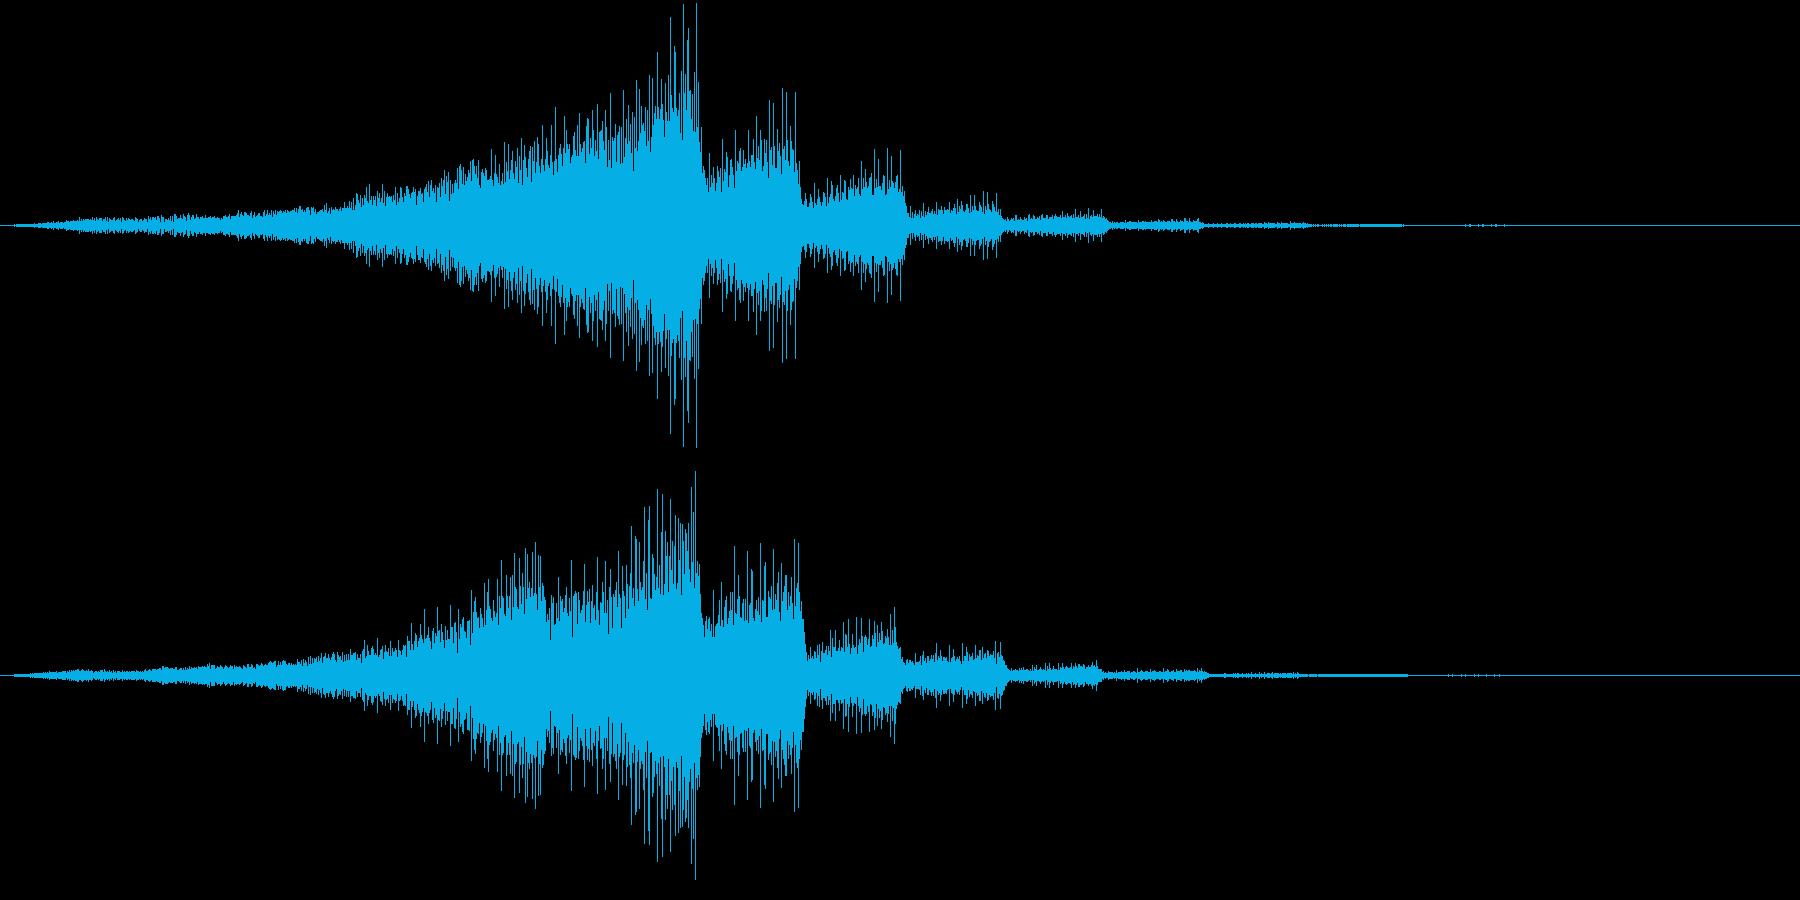 LOGO 企業向け CM サウンドロゴの再生済みの波形